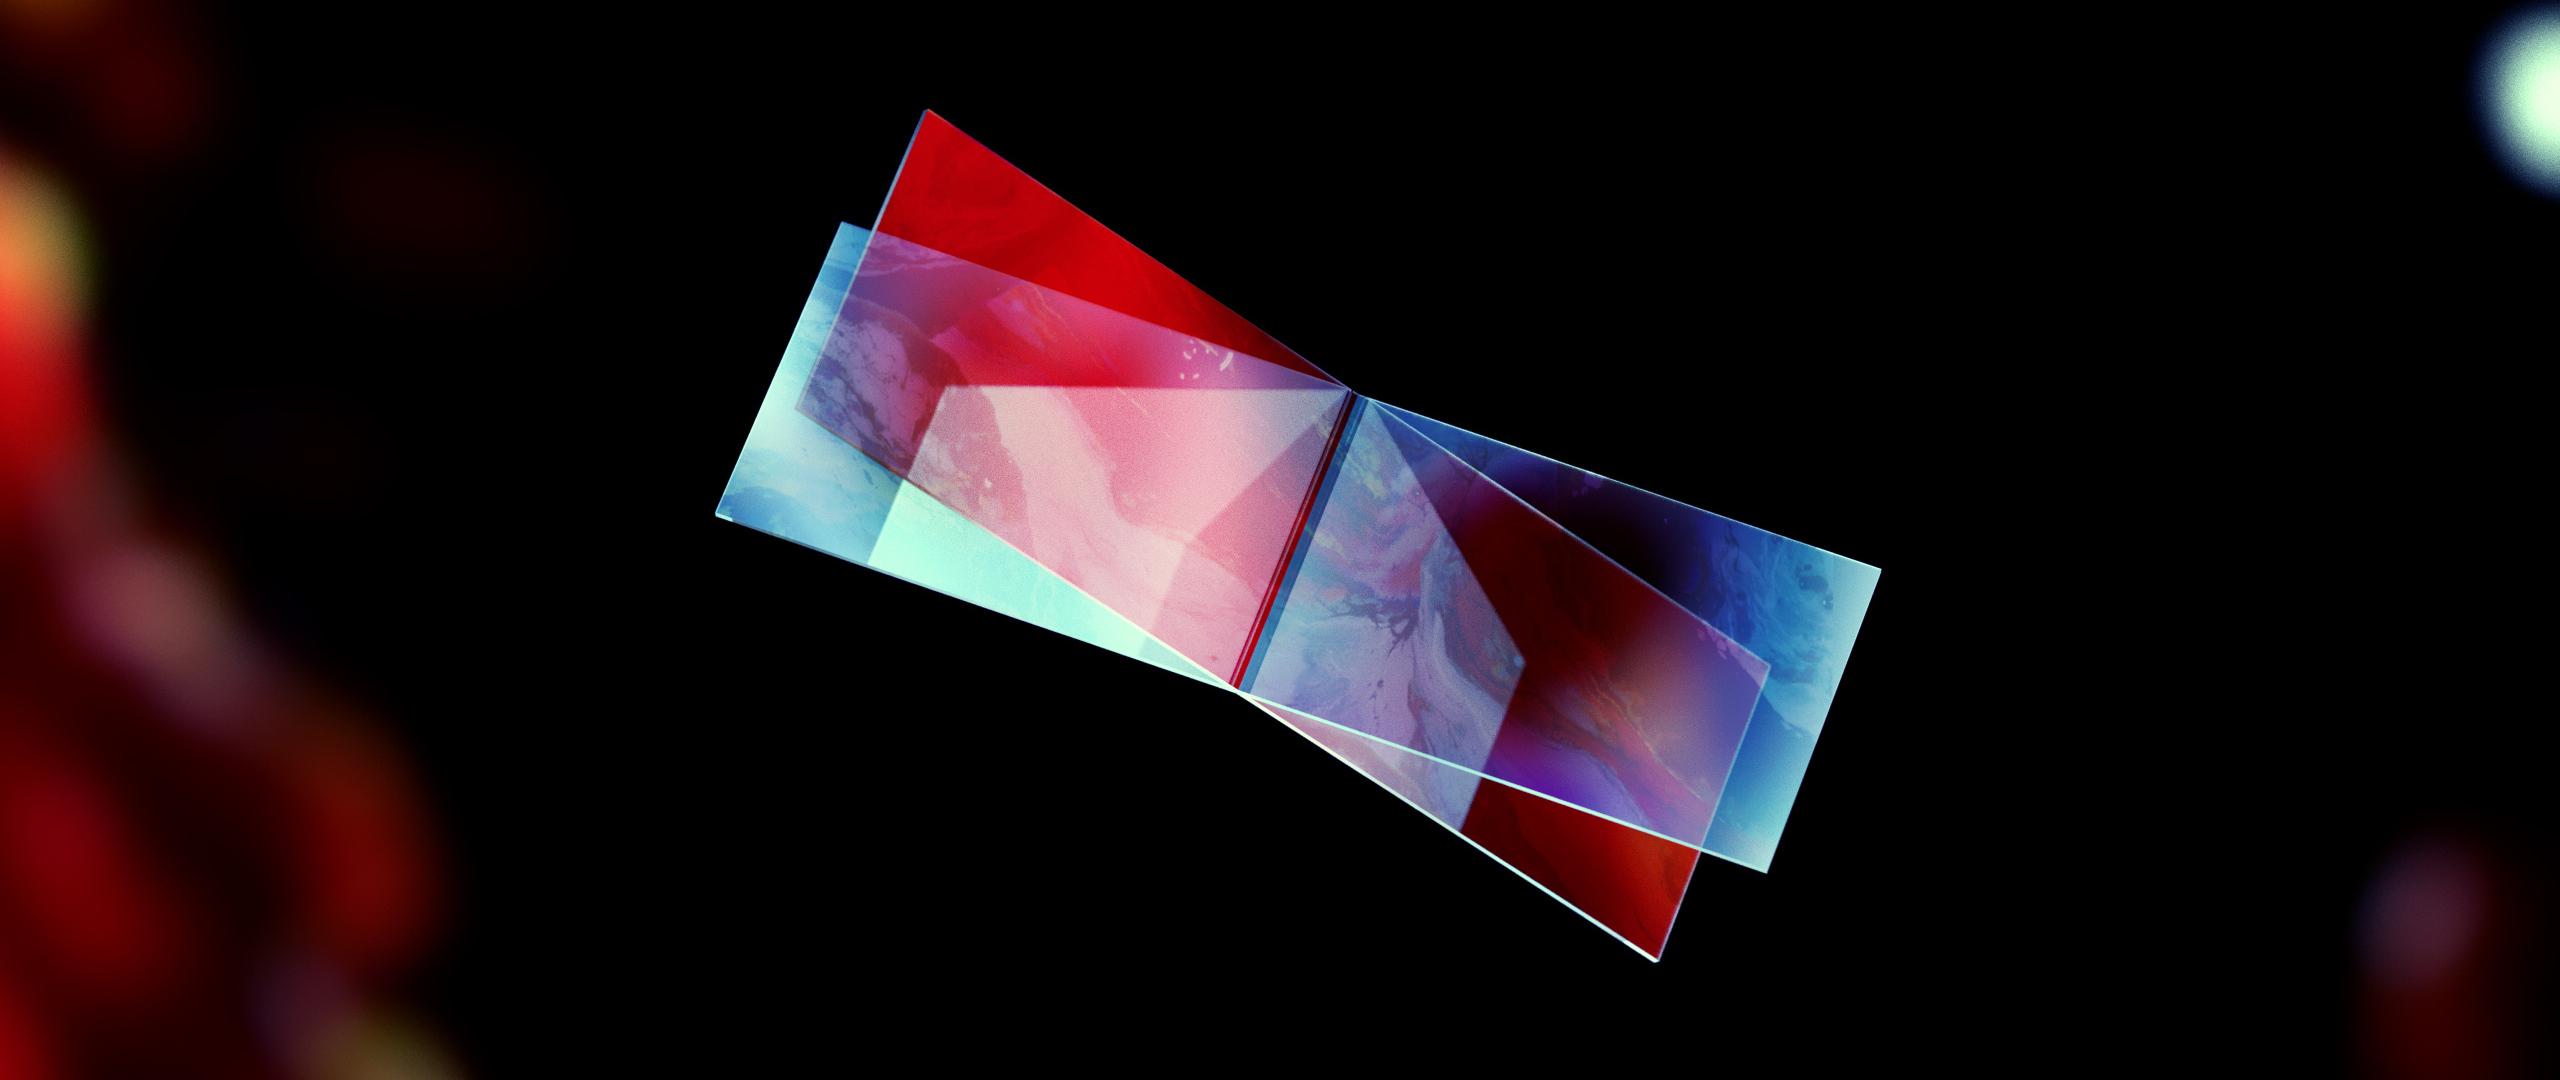 satellite-abstract-kr.jpg